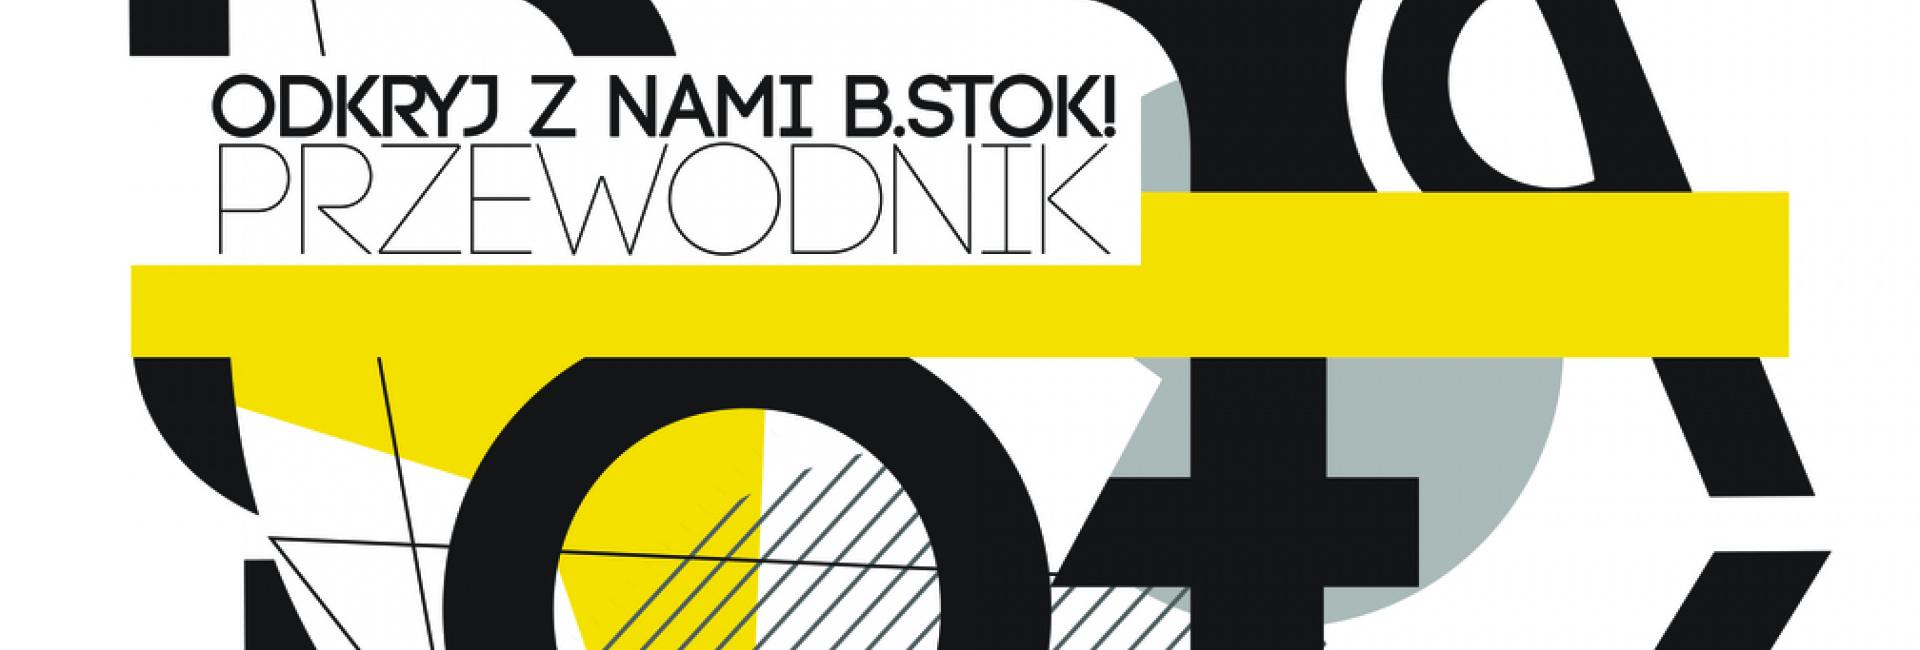 Cultural B.stok Guide